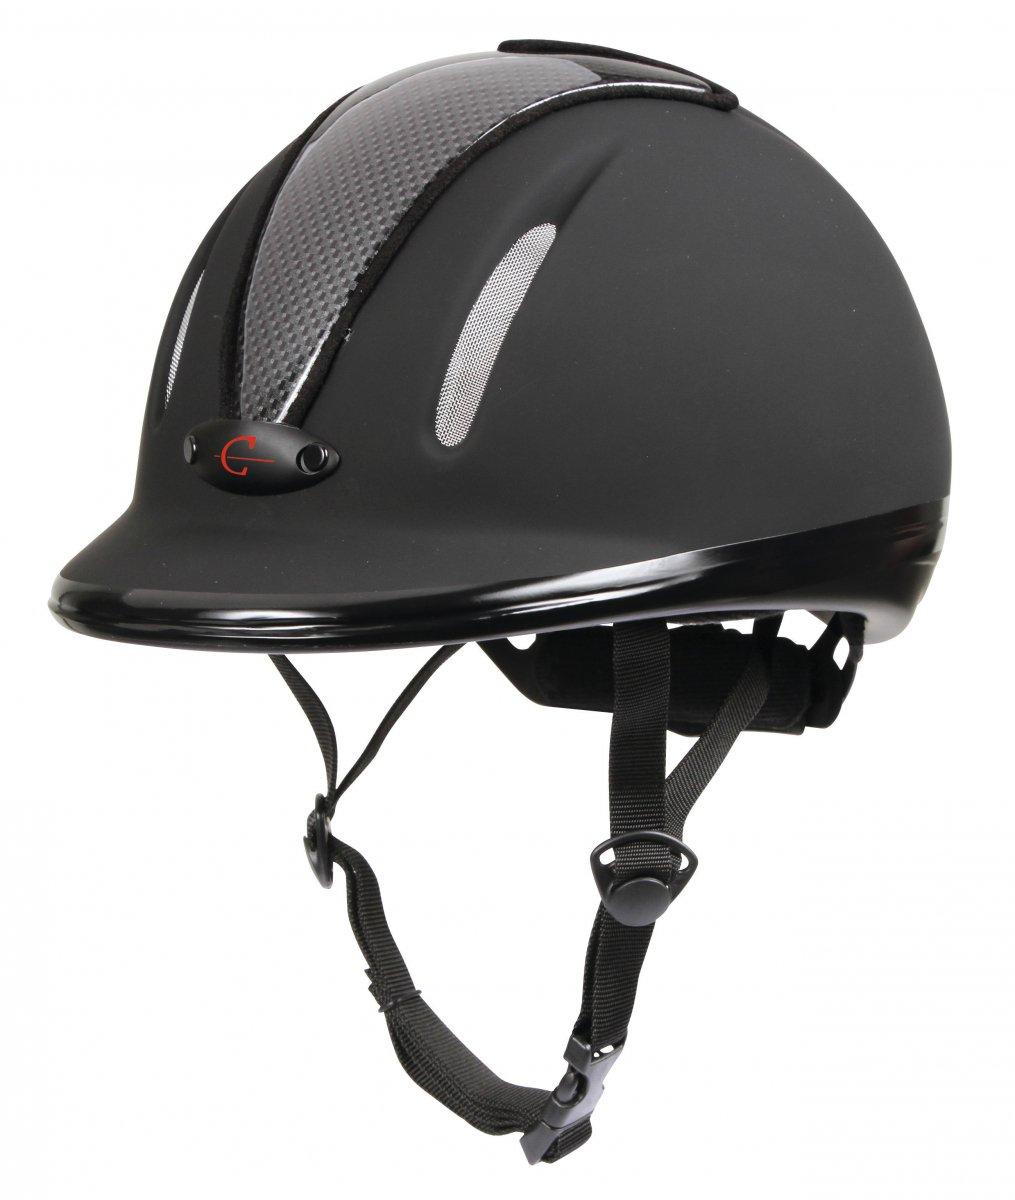 Carbononic Riding Helmba S / M 52 - 57 cm